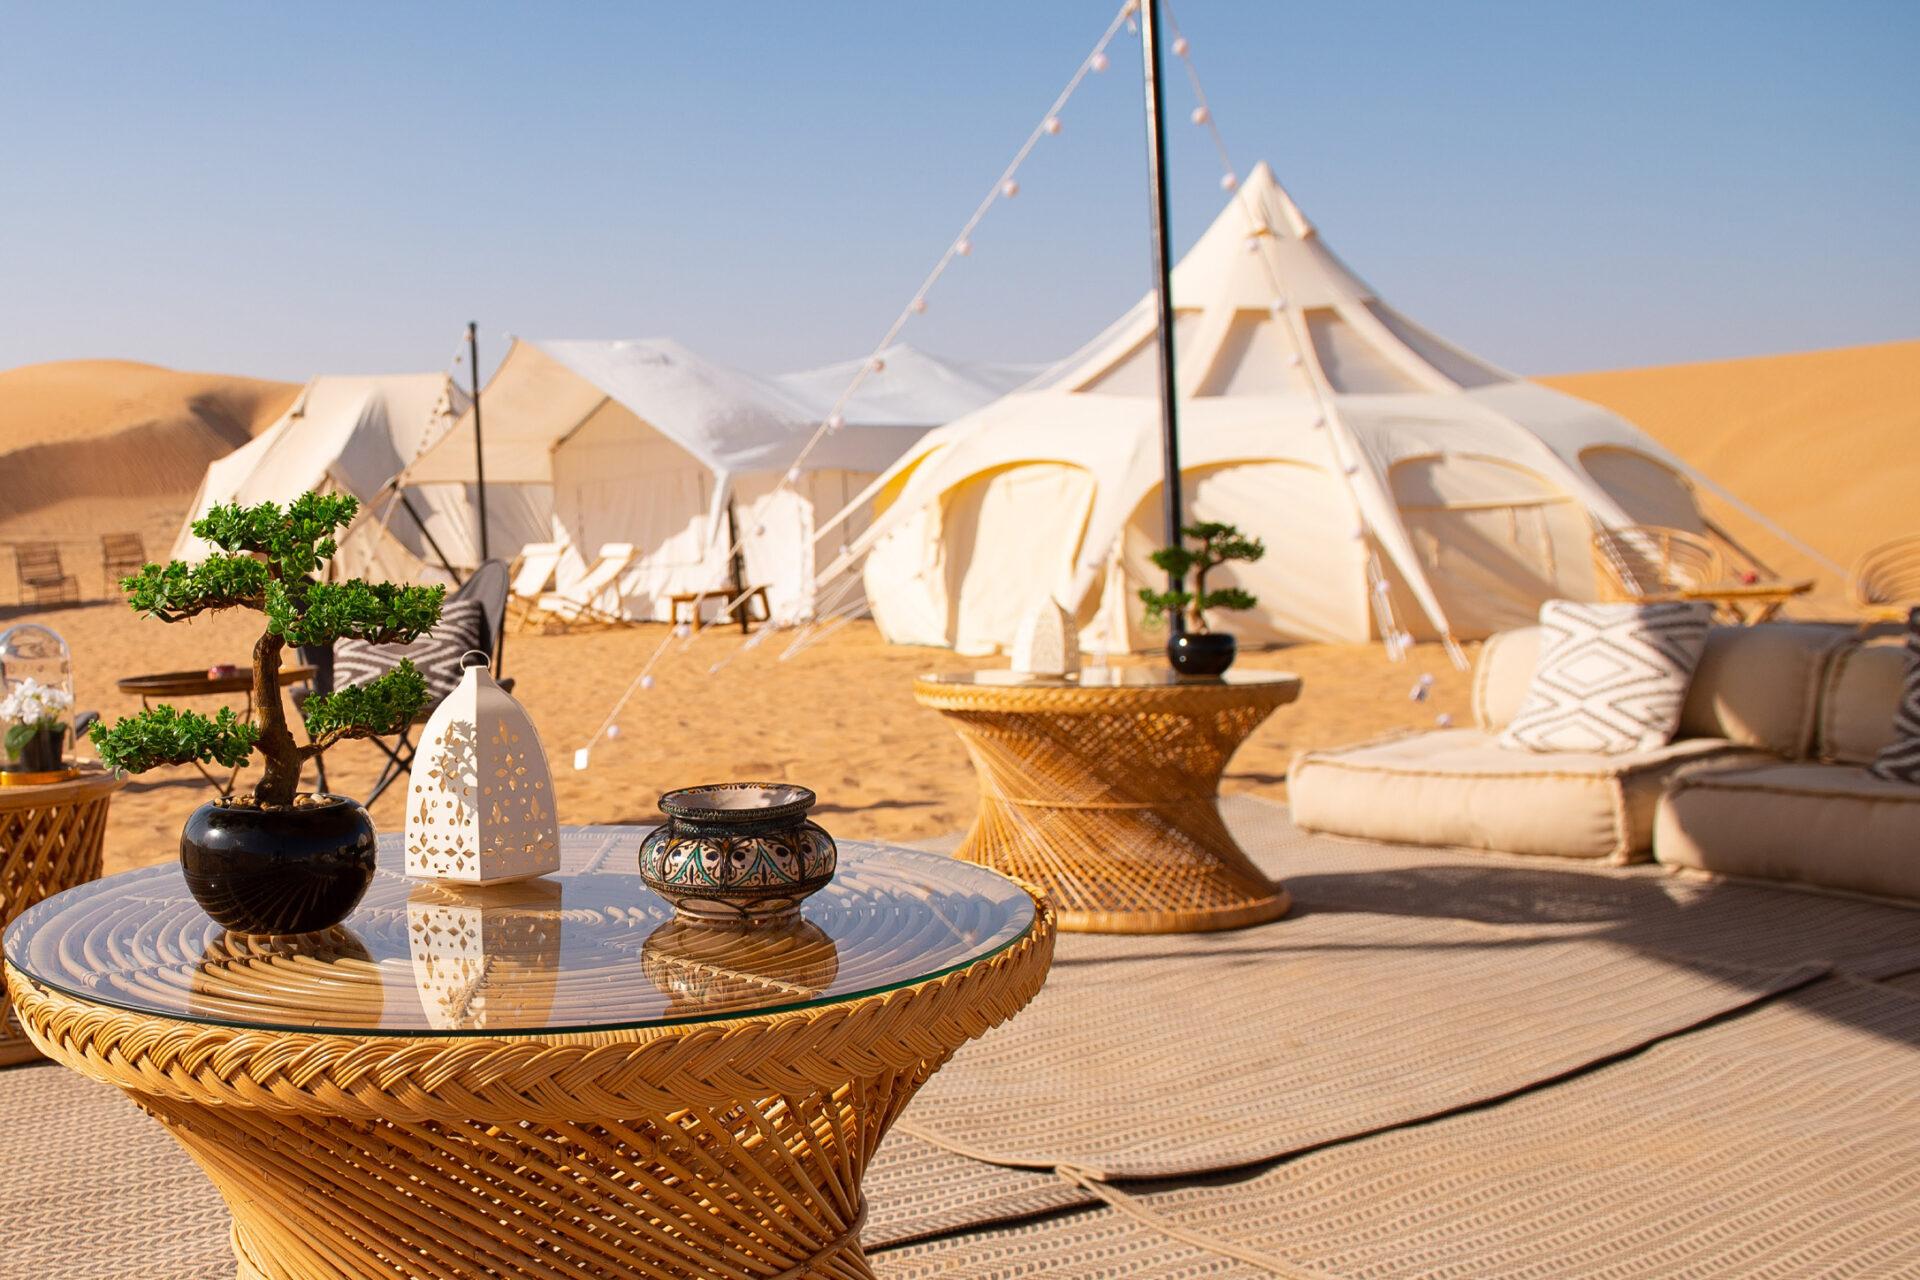 Nara Desert Escape – Dreamy Decadence in the Dubai Desert